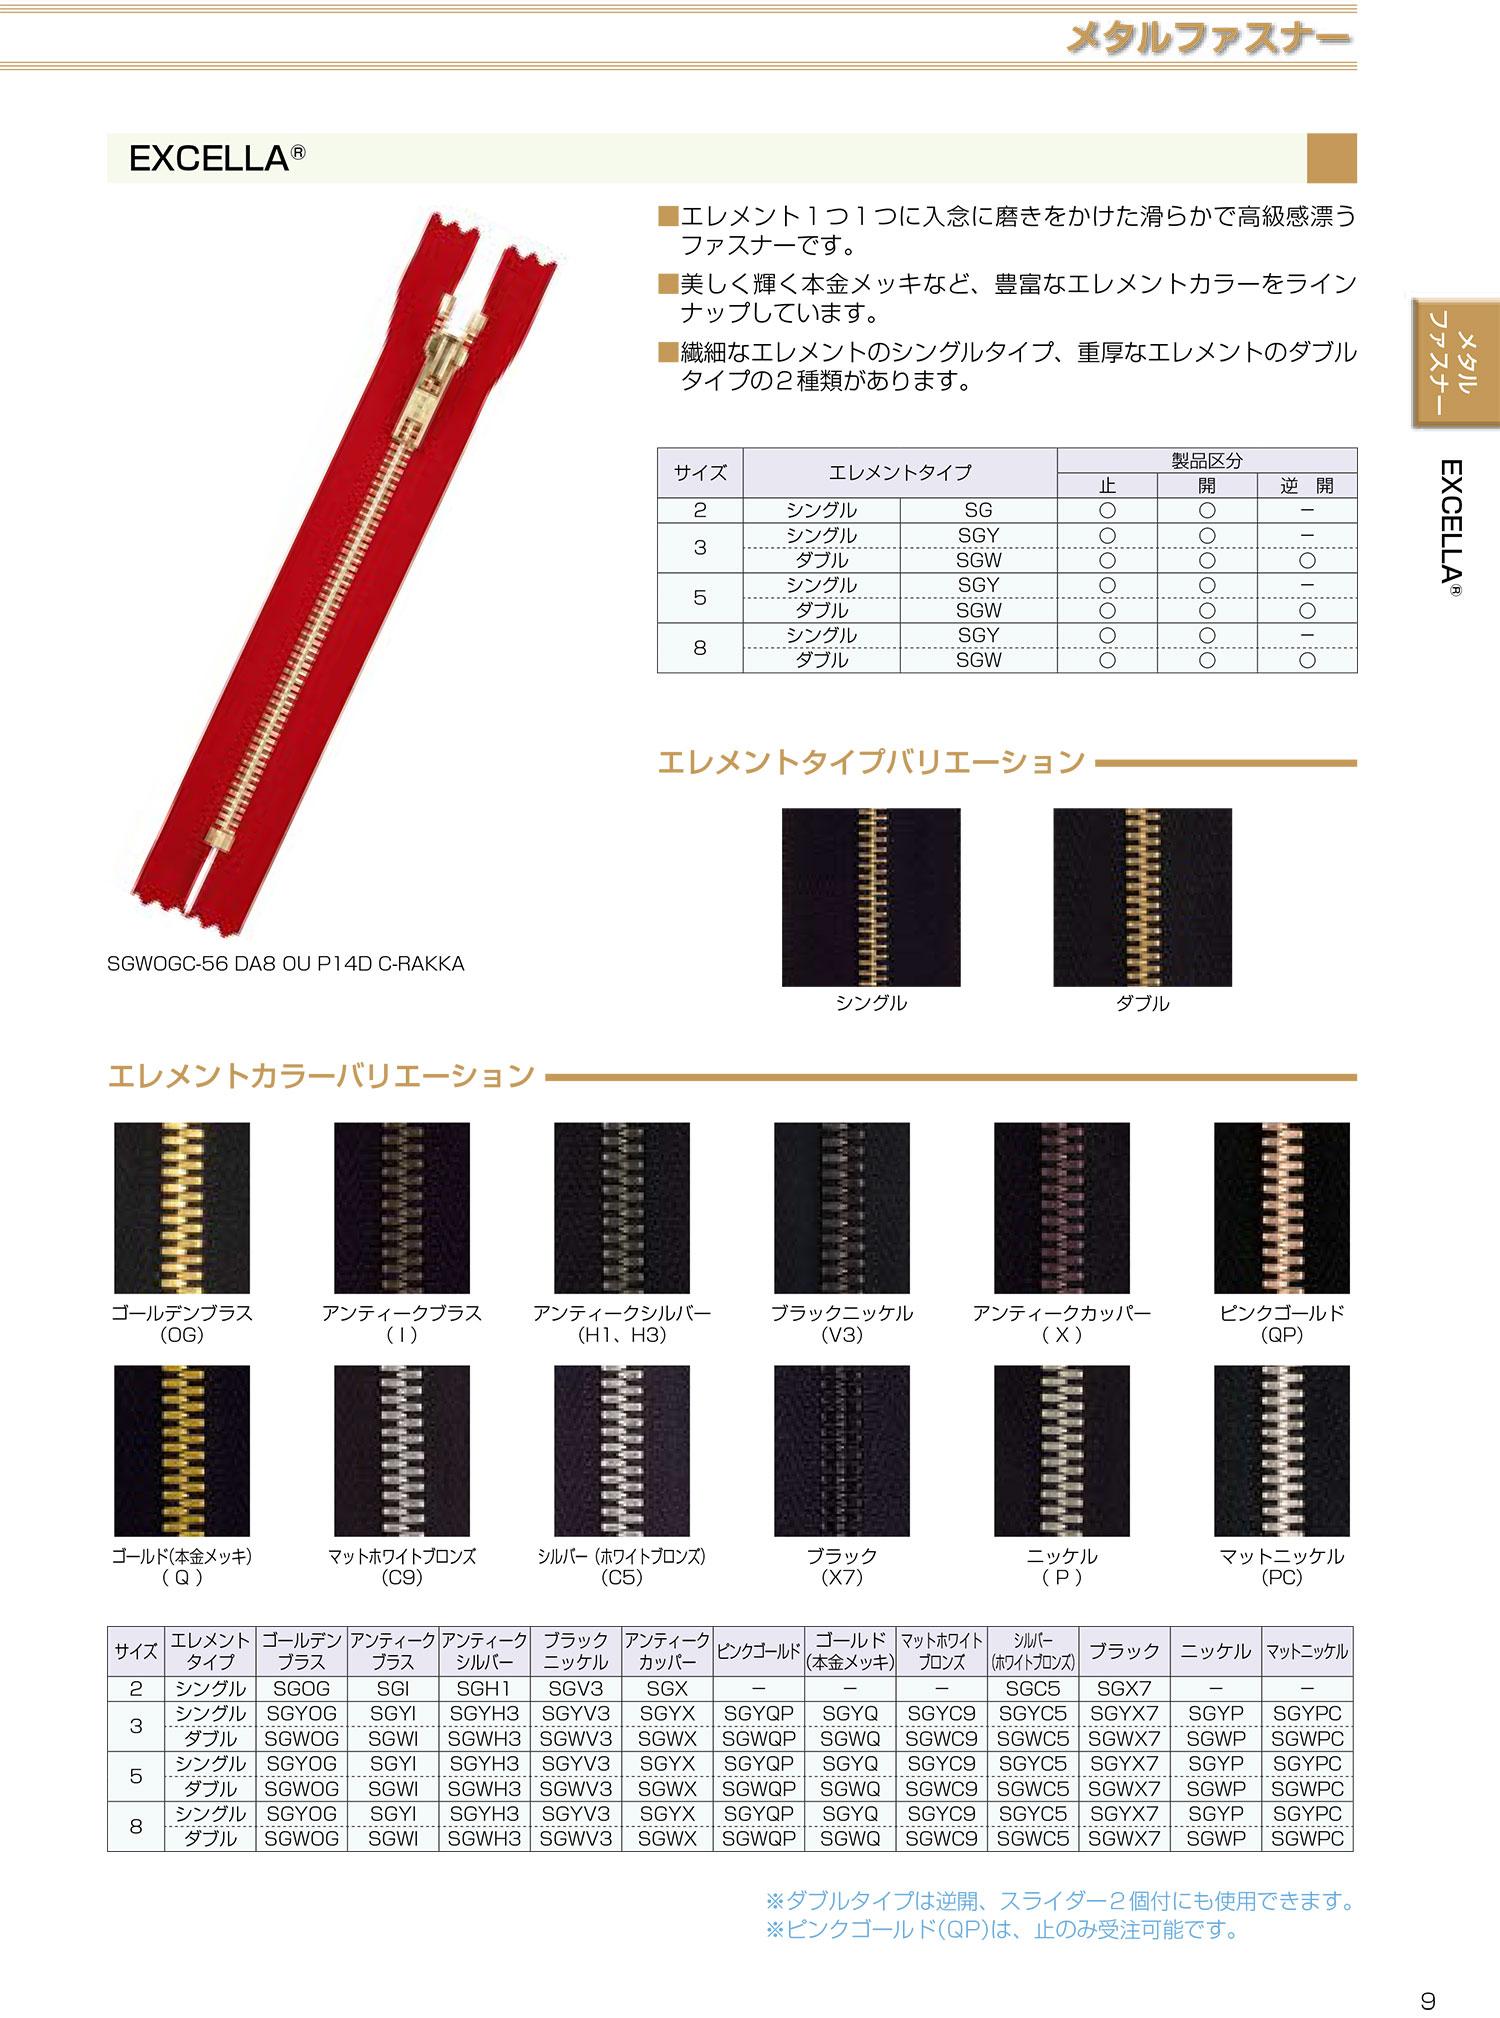 5SGWPMR エクセラ 5サイズ ニッケル 逆開 ダブル[ファスナー] YKK/オークラ商事 - ApparelX アパレル資材卸通販